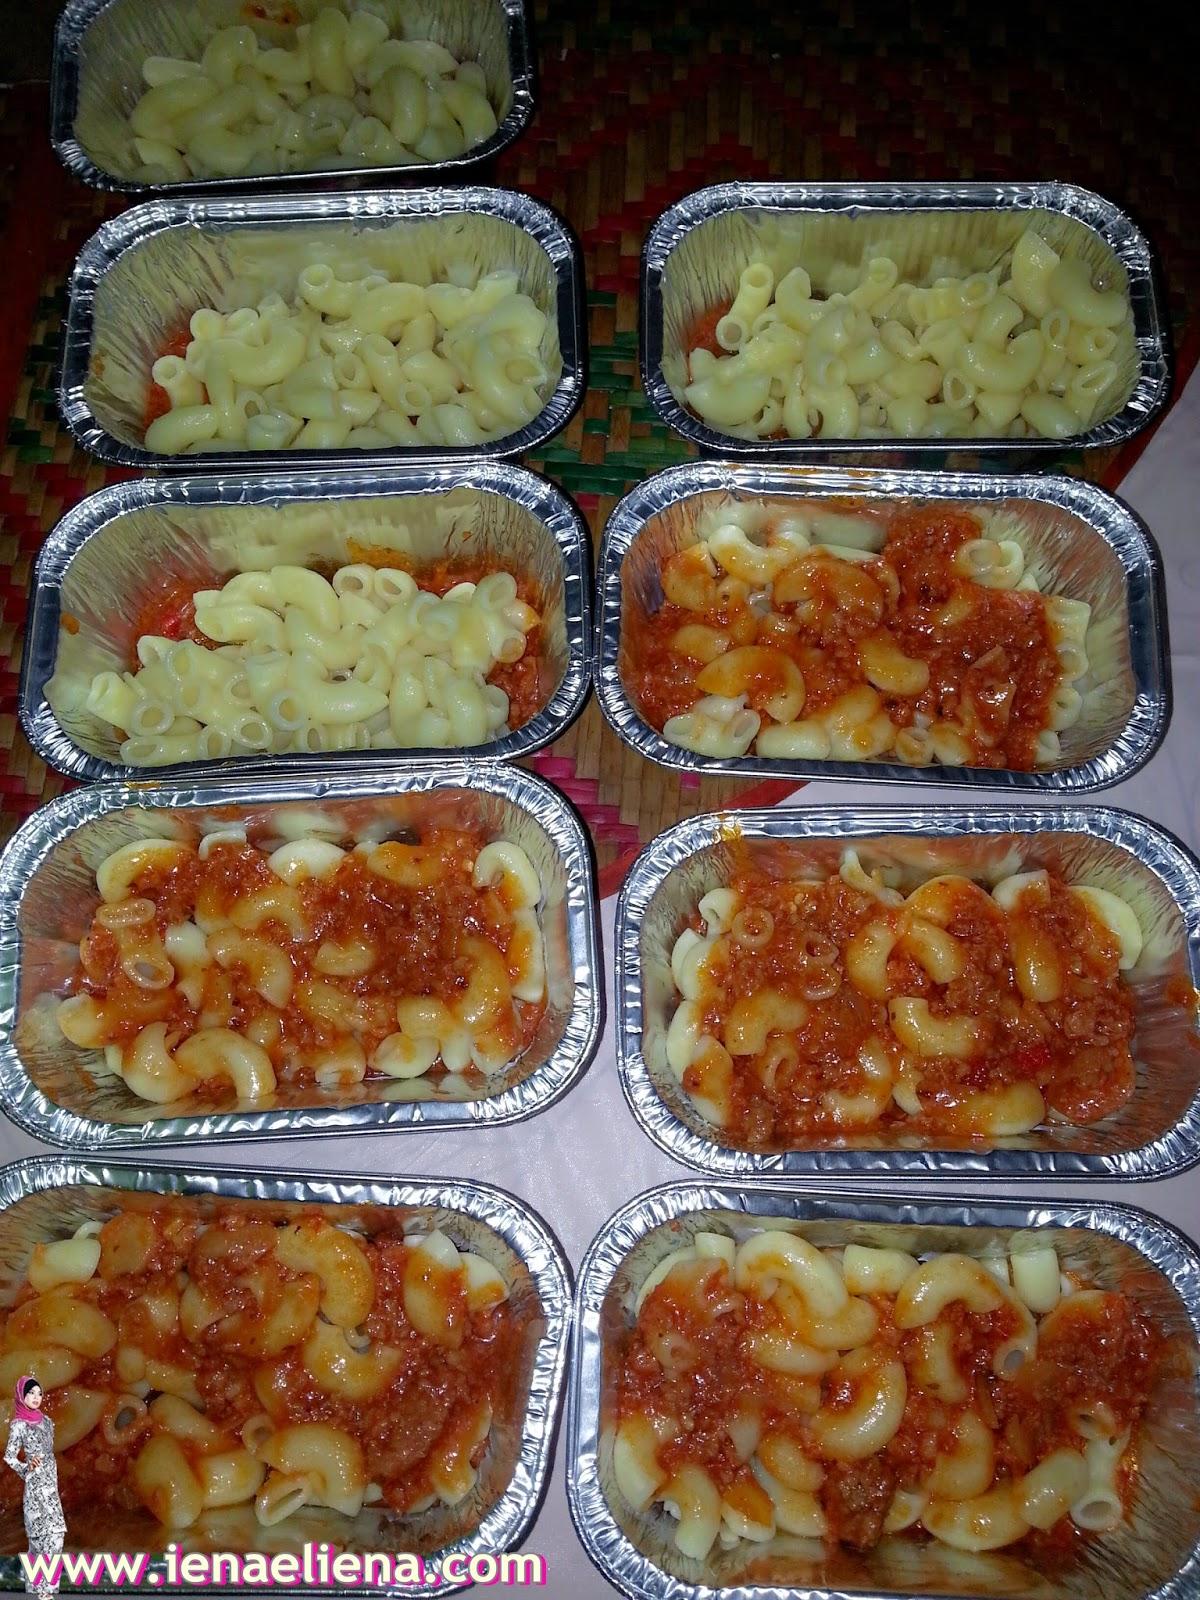 Qaseh baked macaroni